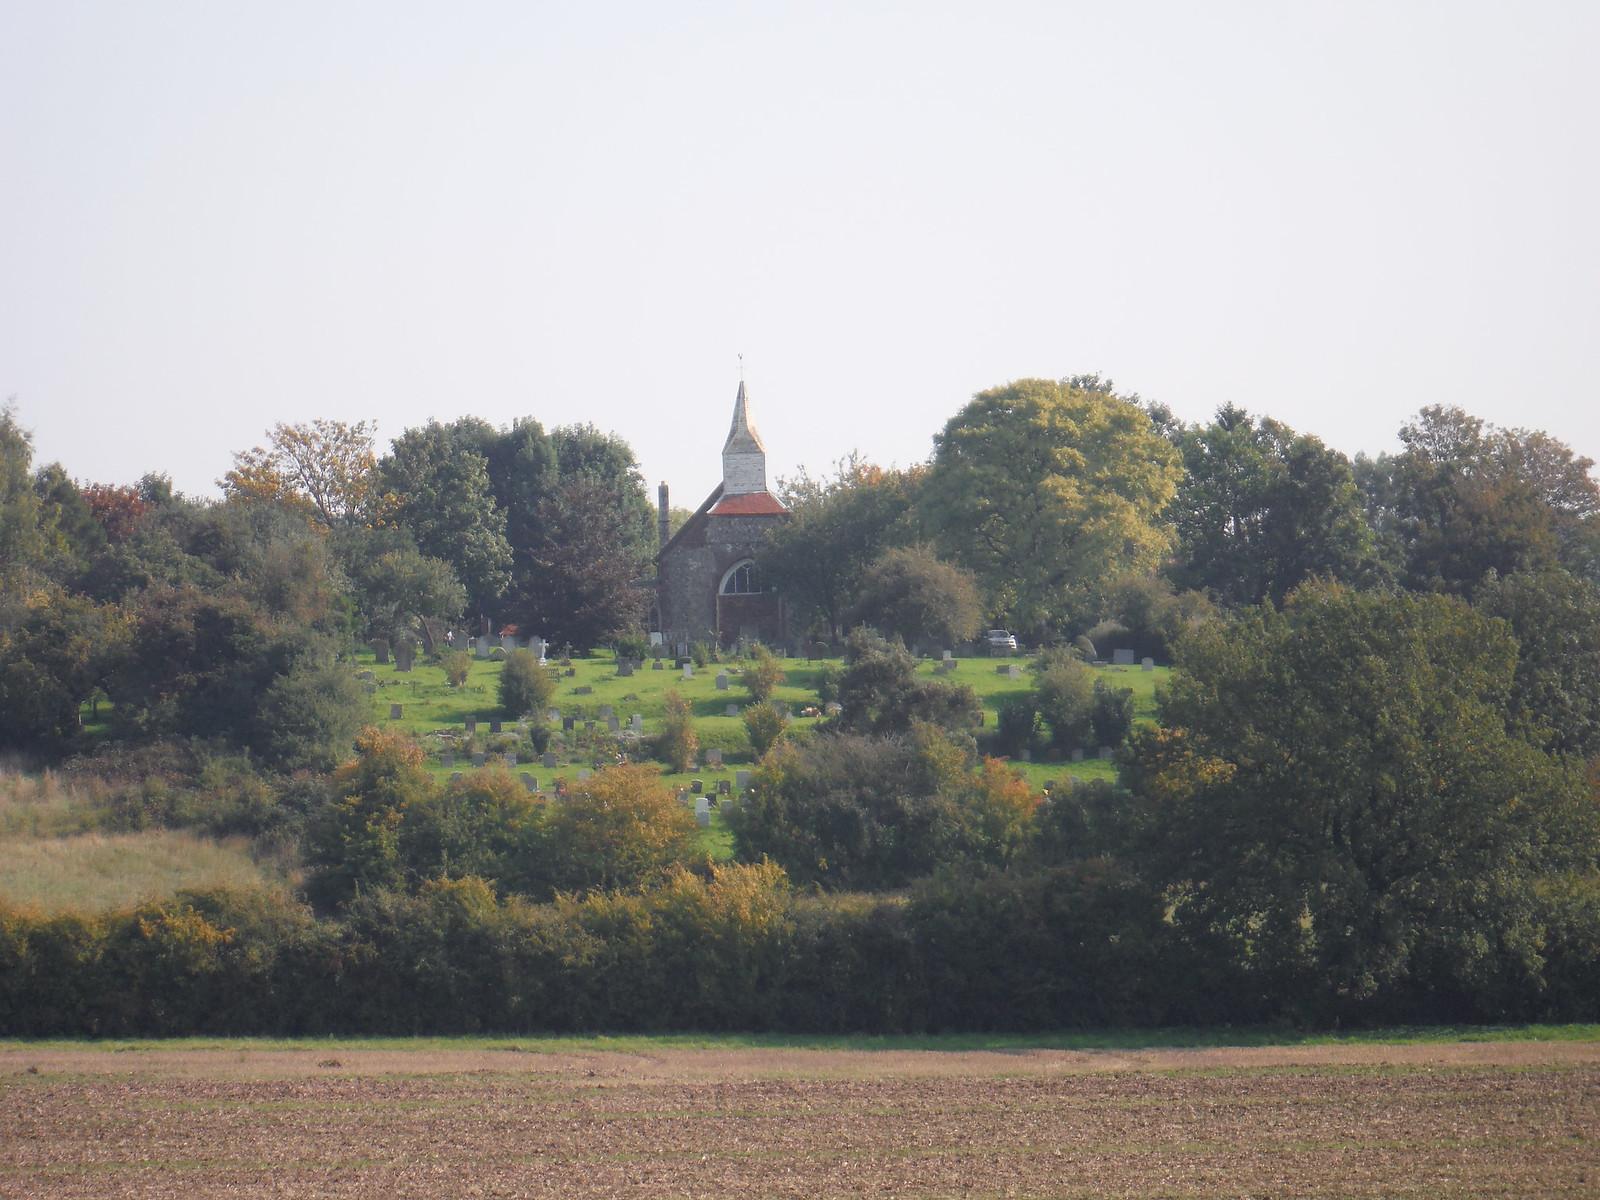 View back to Woodham Ferrers Church SWC Walk 159 South Woodham Ferrers to North Fambridge